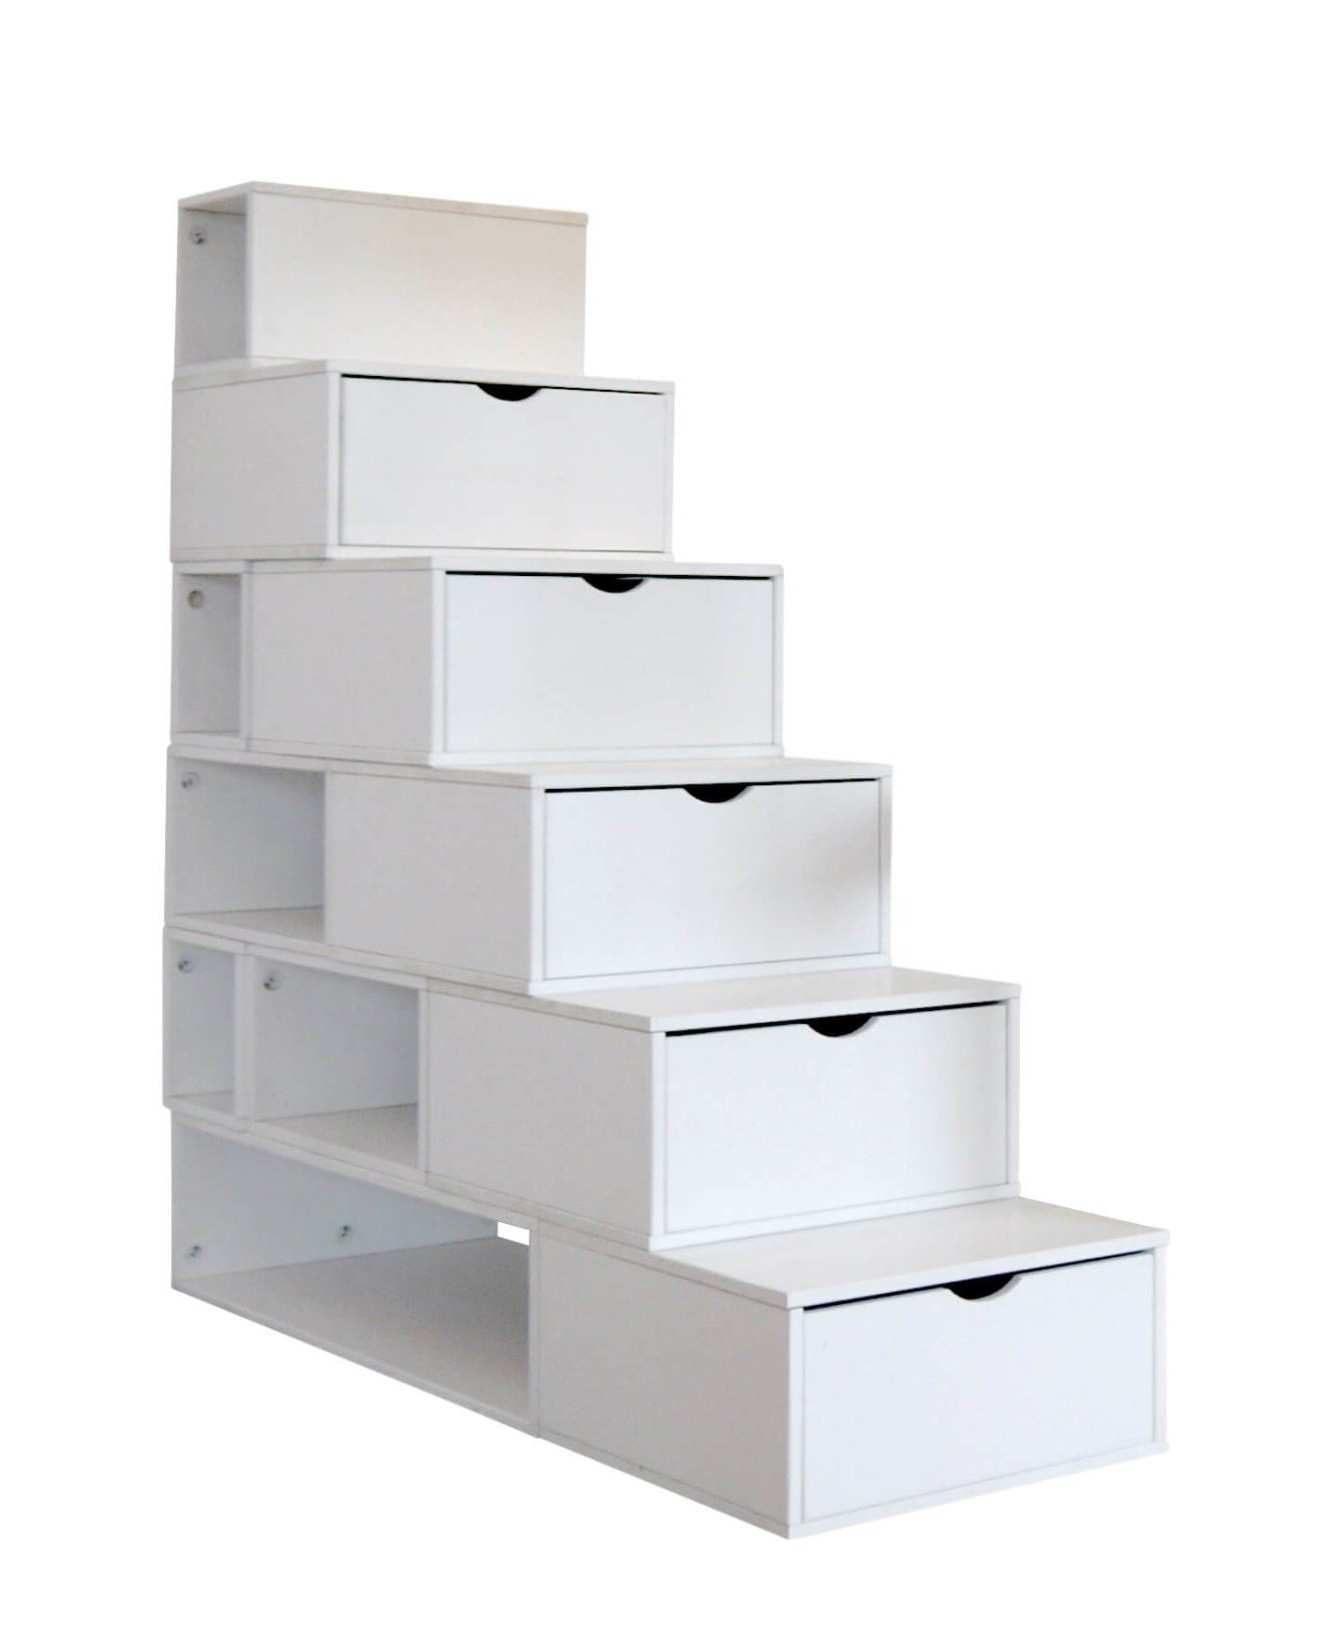 Meuble Cube Pas Cher Elegant Meuble Escalier Pas Cher Encequiconcerne Meuble Cube Pas Cher Agencecormierdelauniere Com Agencecormierdelauniere Com